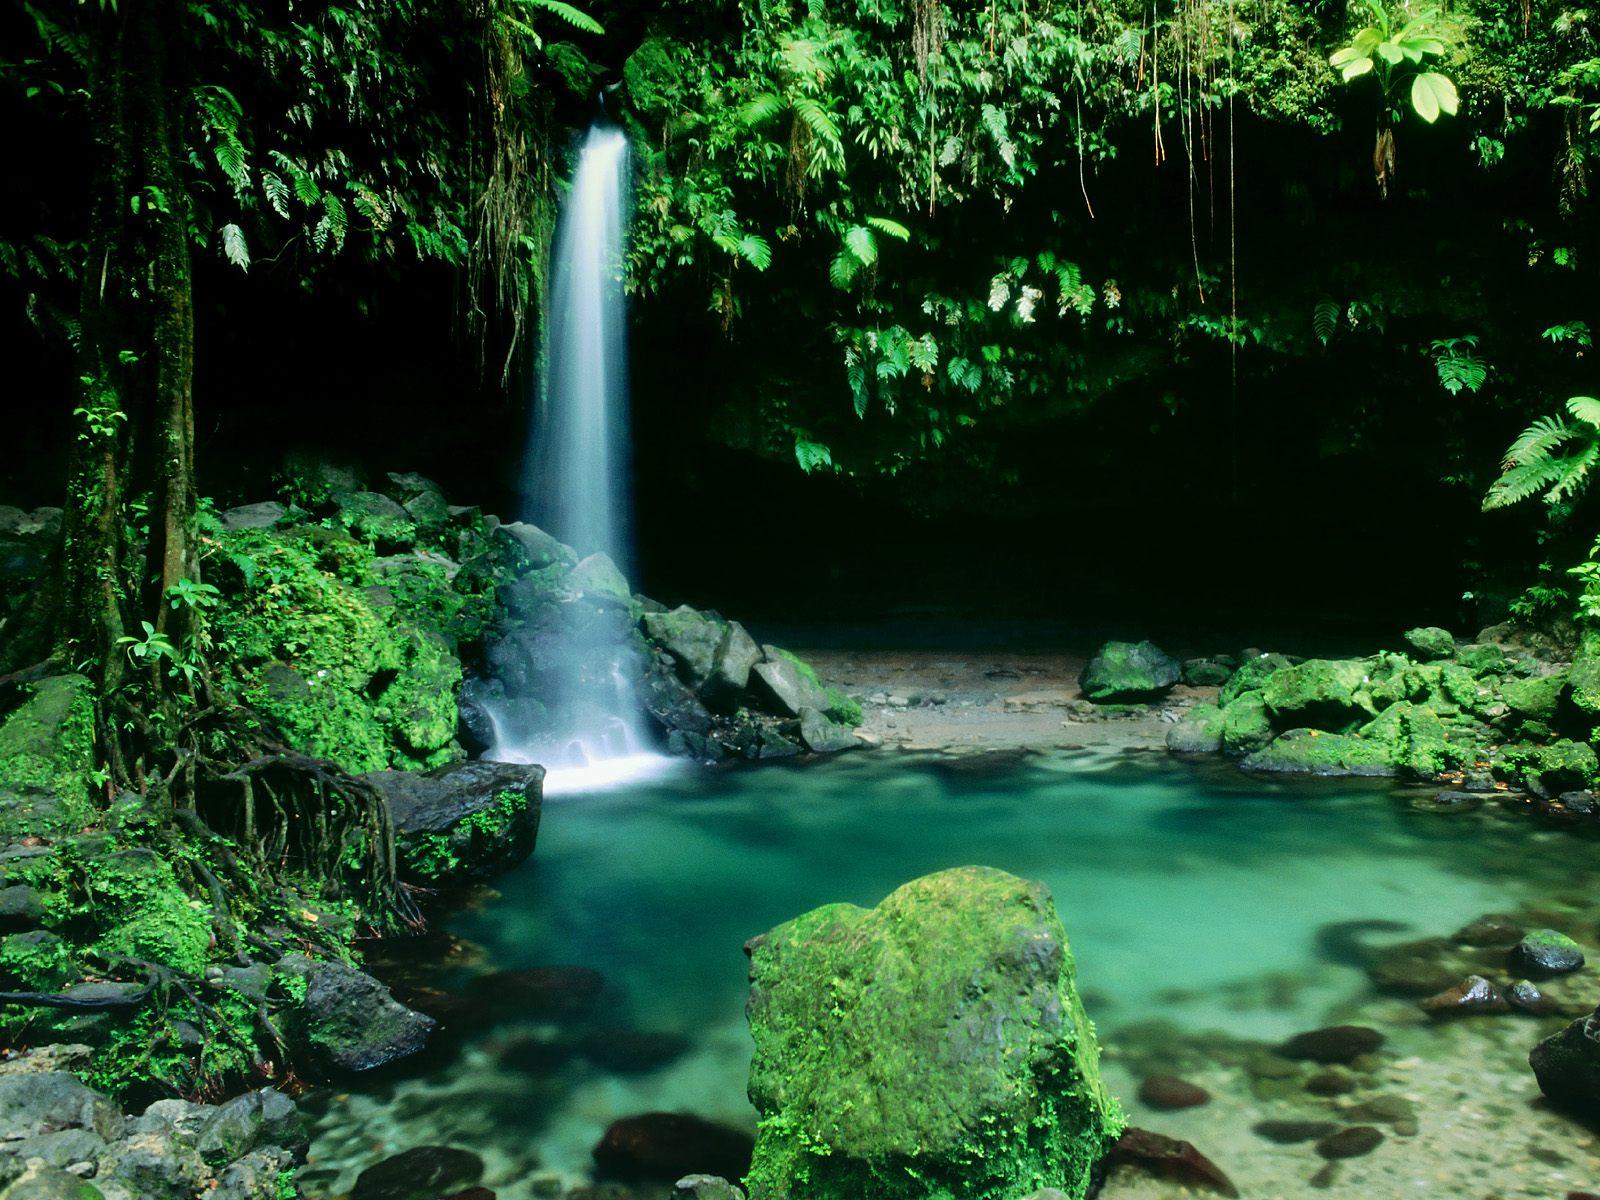 Cachoeira Paradisíaca